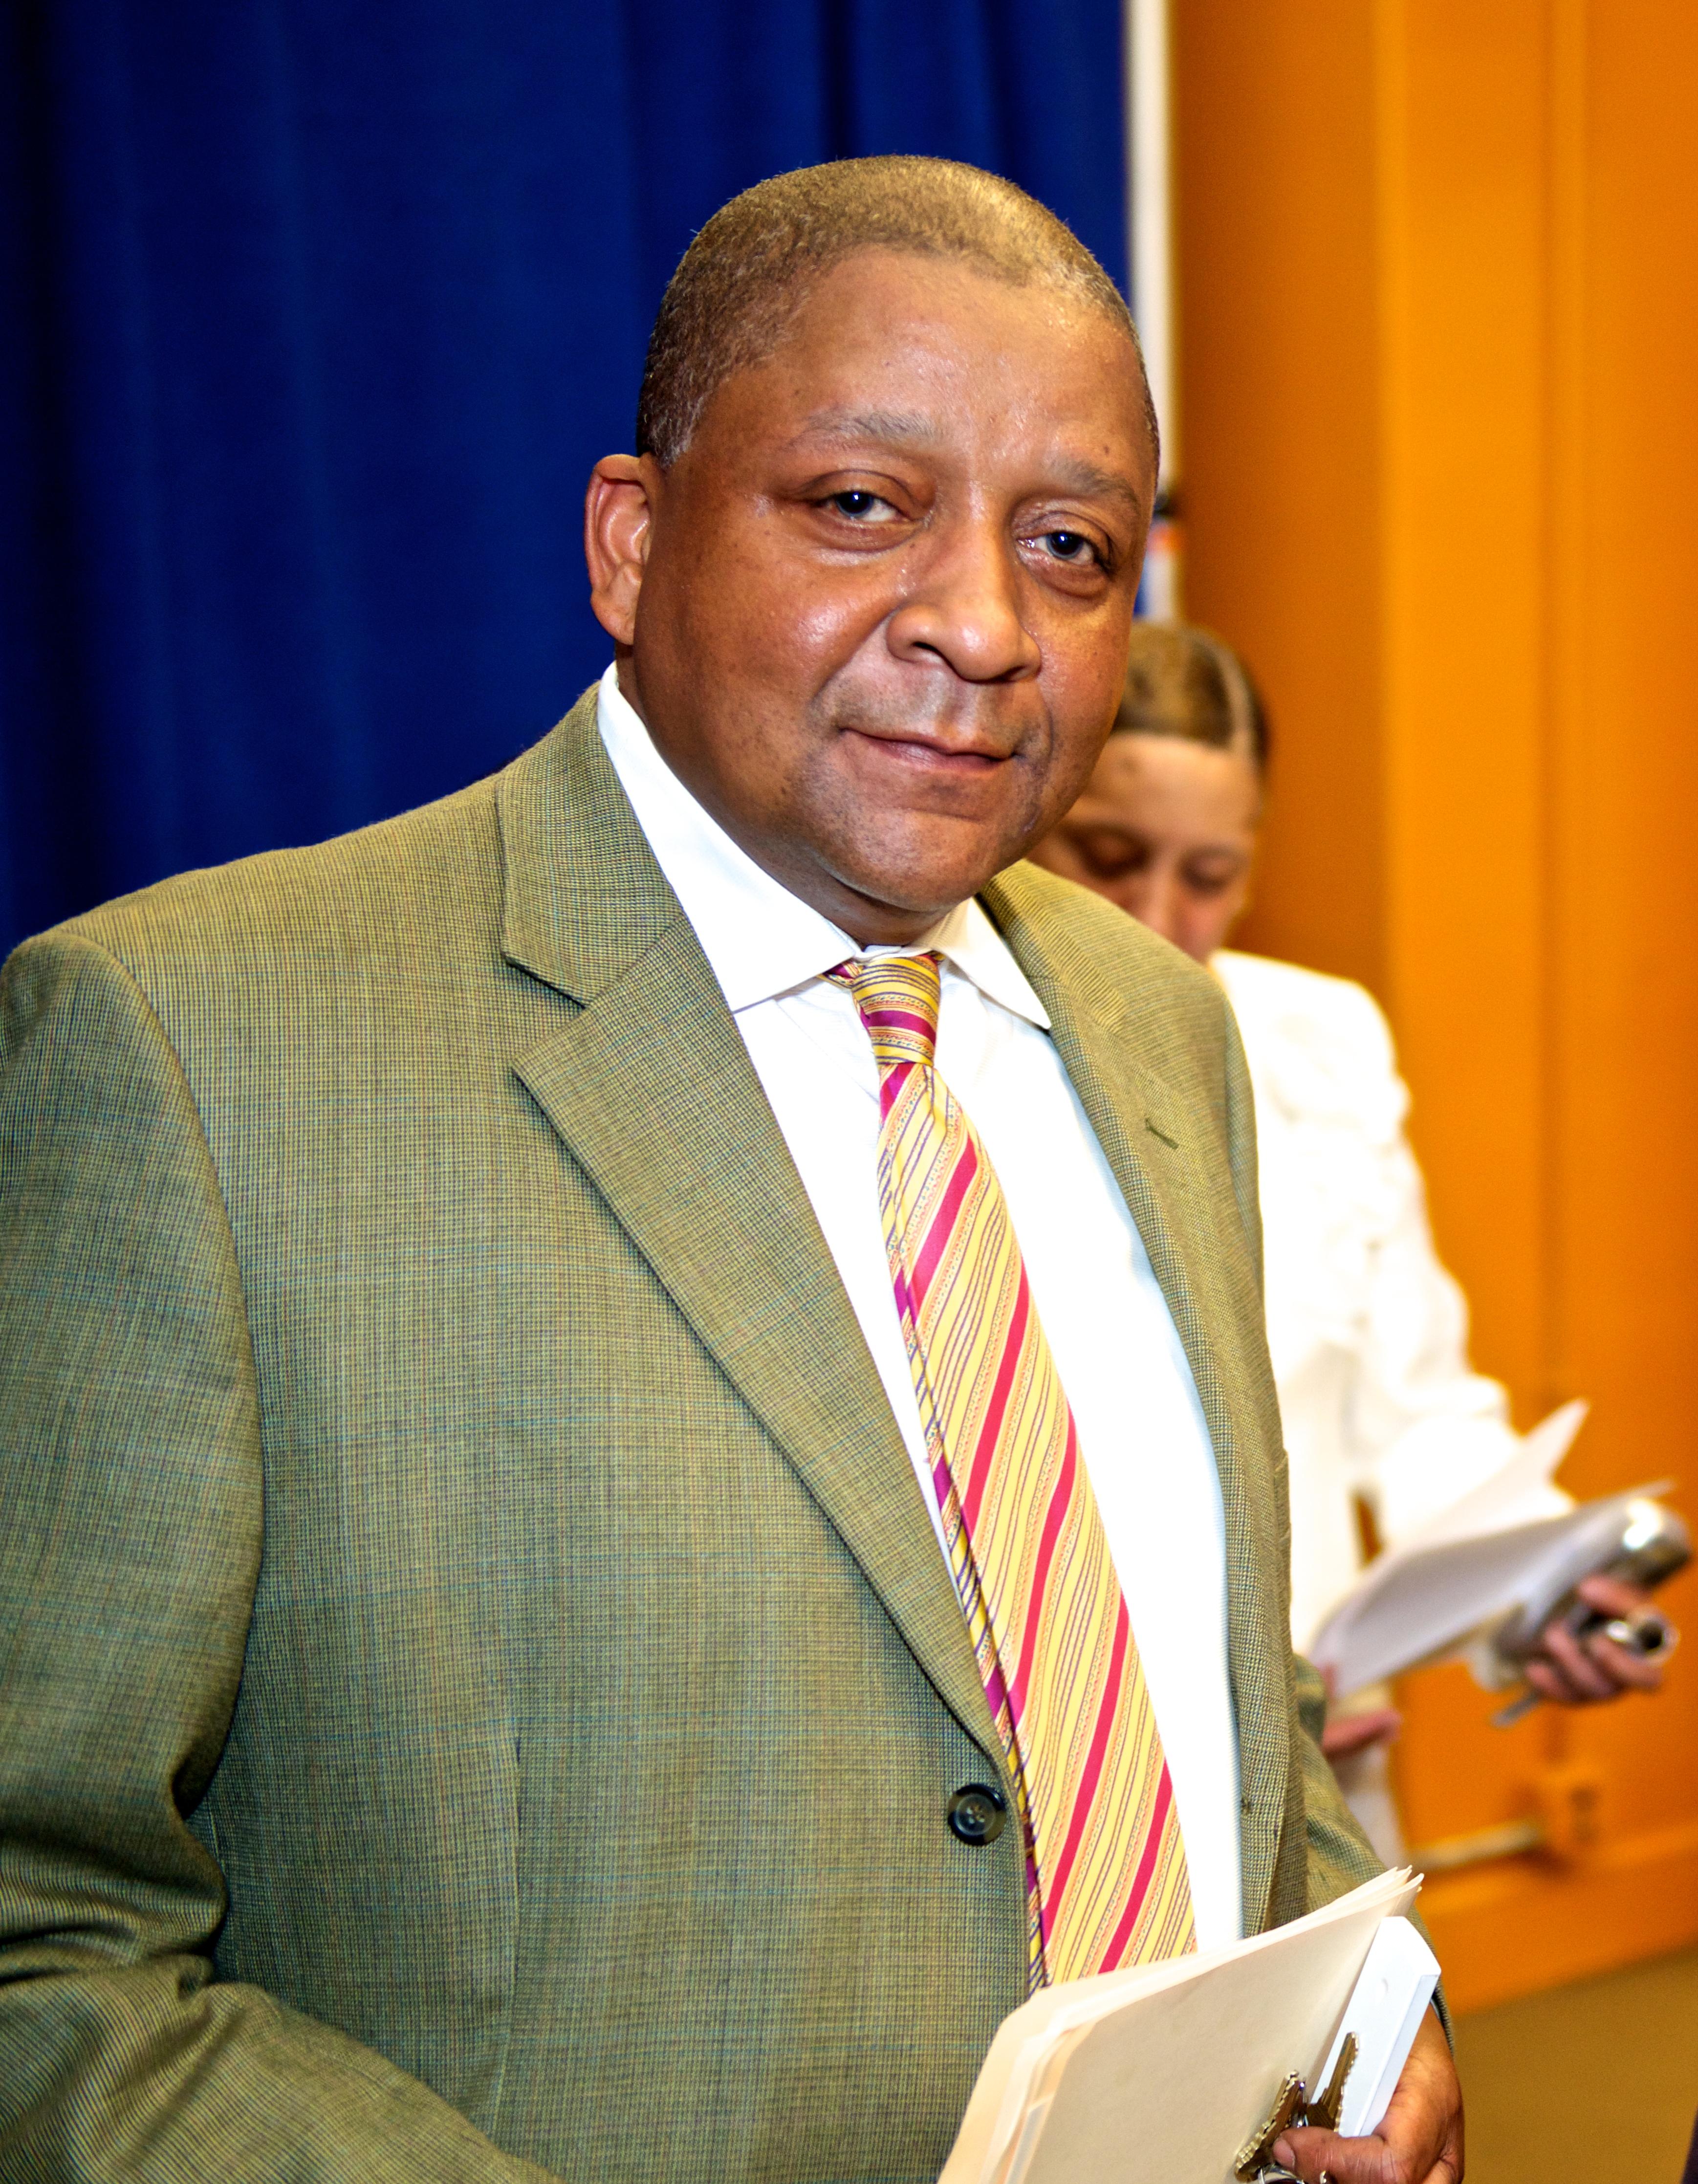 Principal of Duke Ellington School dies suddenly